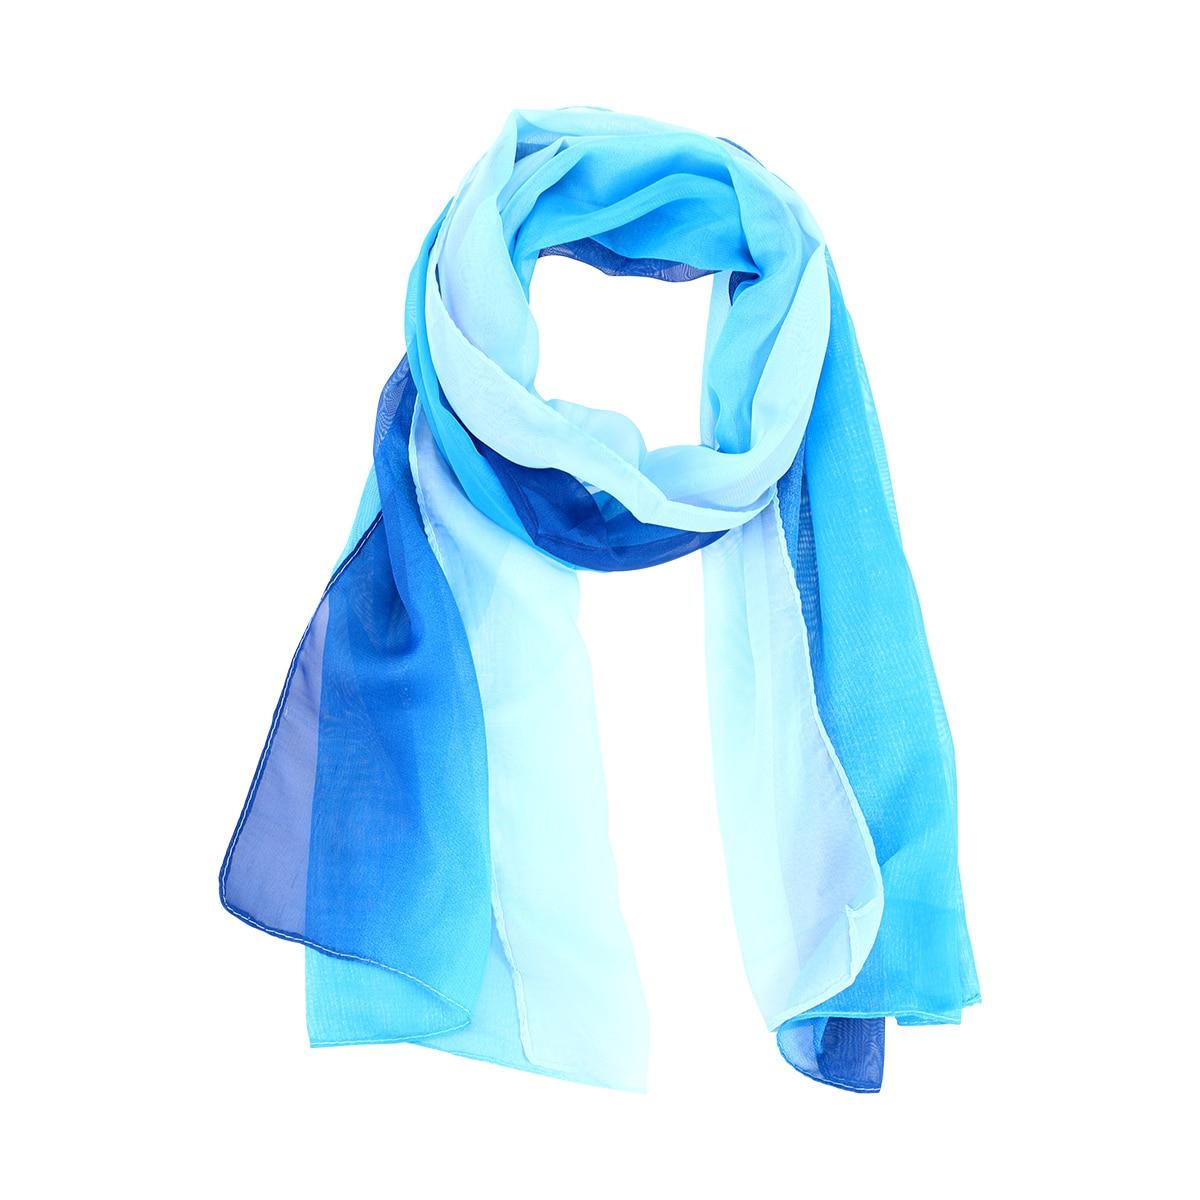 Unique Womens Elegant Scarves Chiffon Gradient Color Scarf (Blue And White)